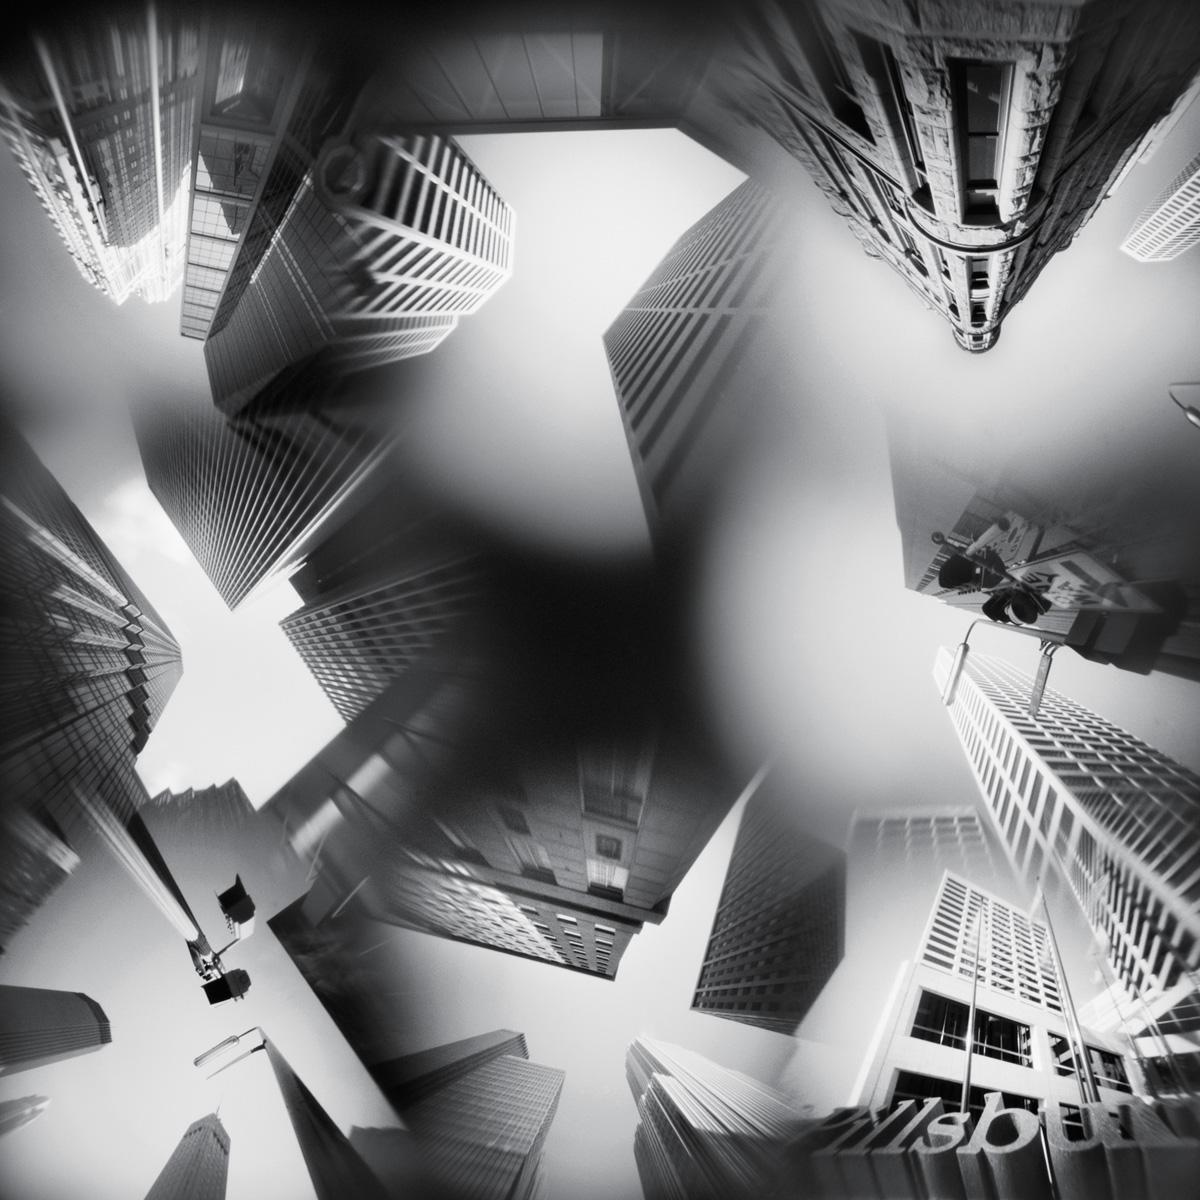 Downtown Minneapolis 9 - pinhole camera photograph